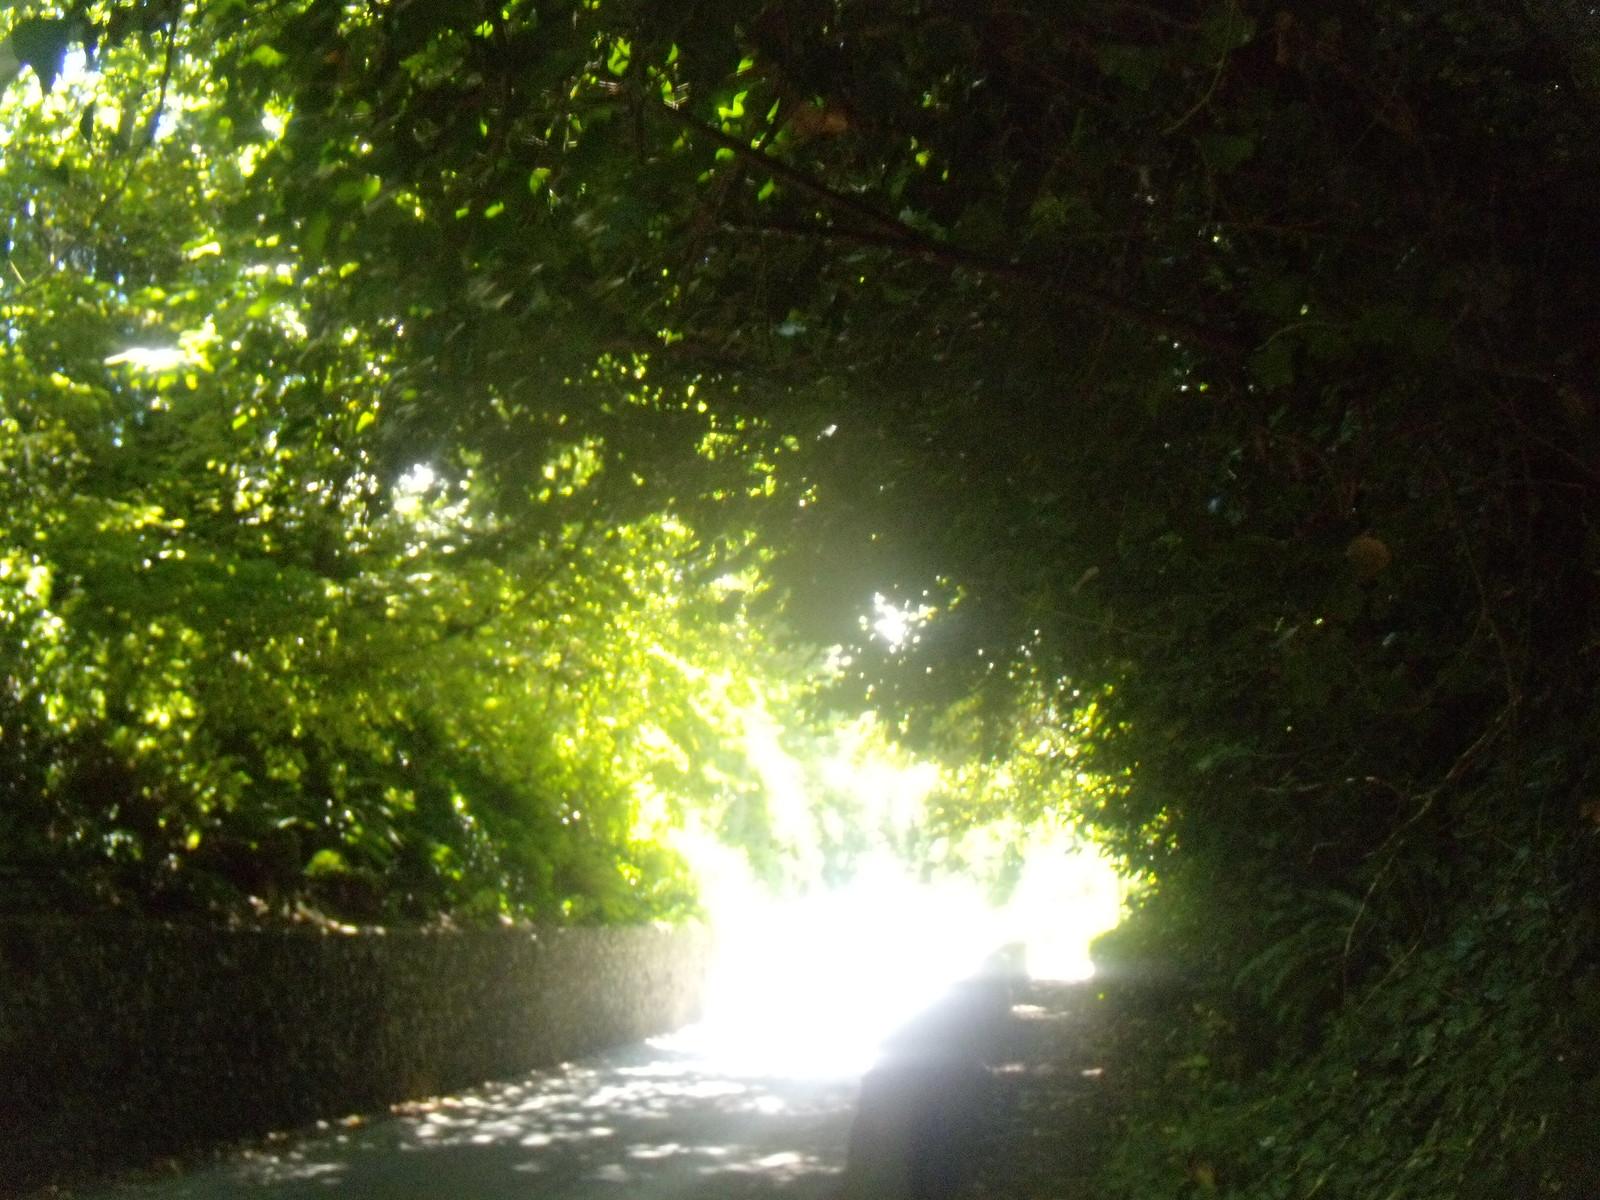 Strong sun, Wilmington Berwick to Birling Gap